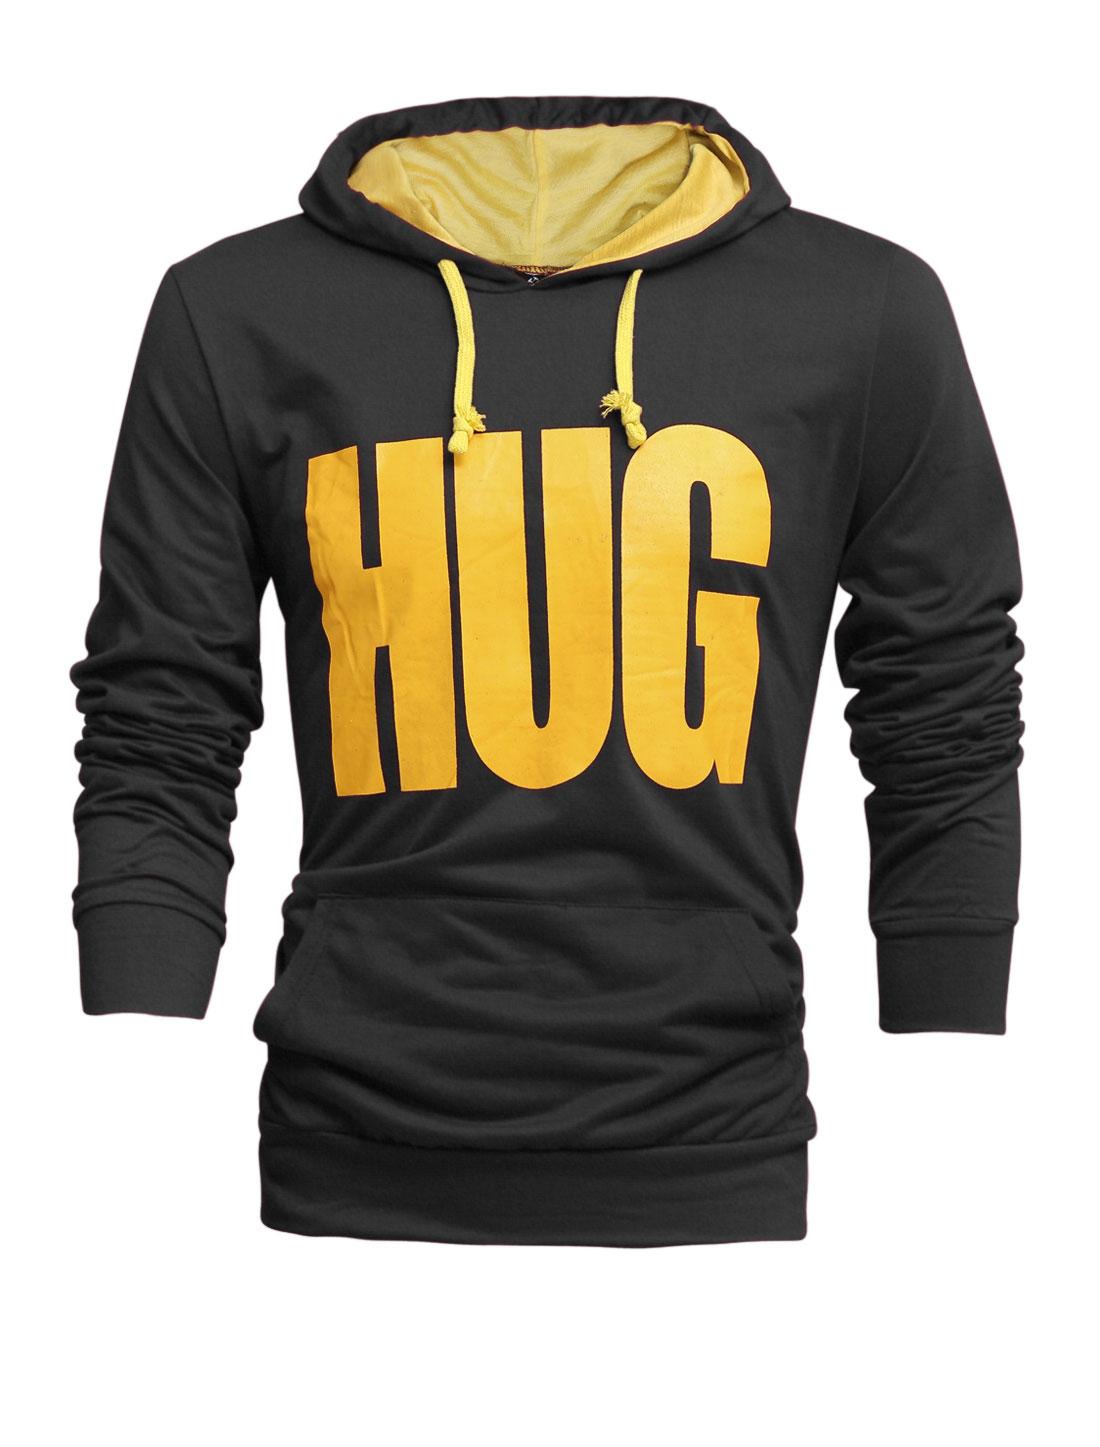 Men Drawstring Hooded Letters Prints Kangaroo Pocket Front Top Shirt Dark Gray M